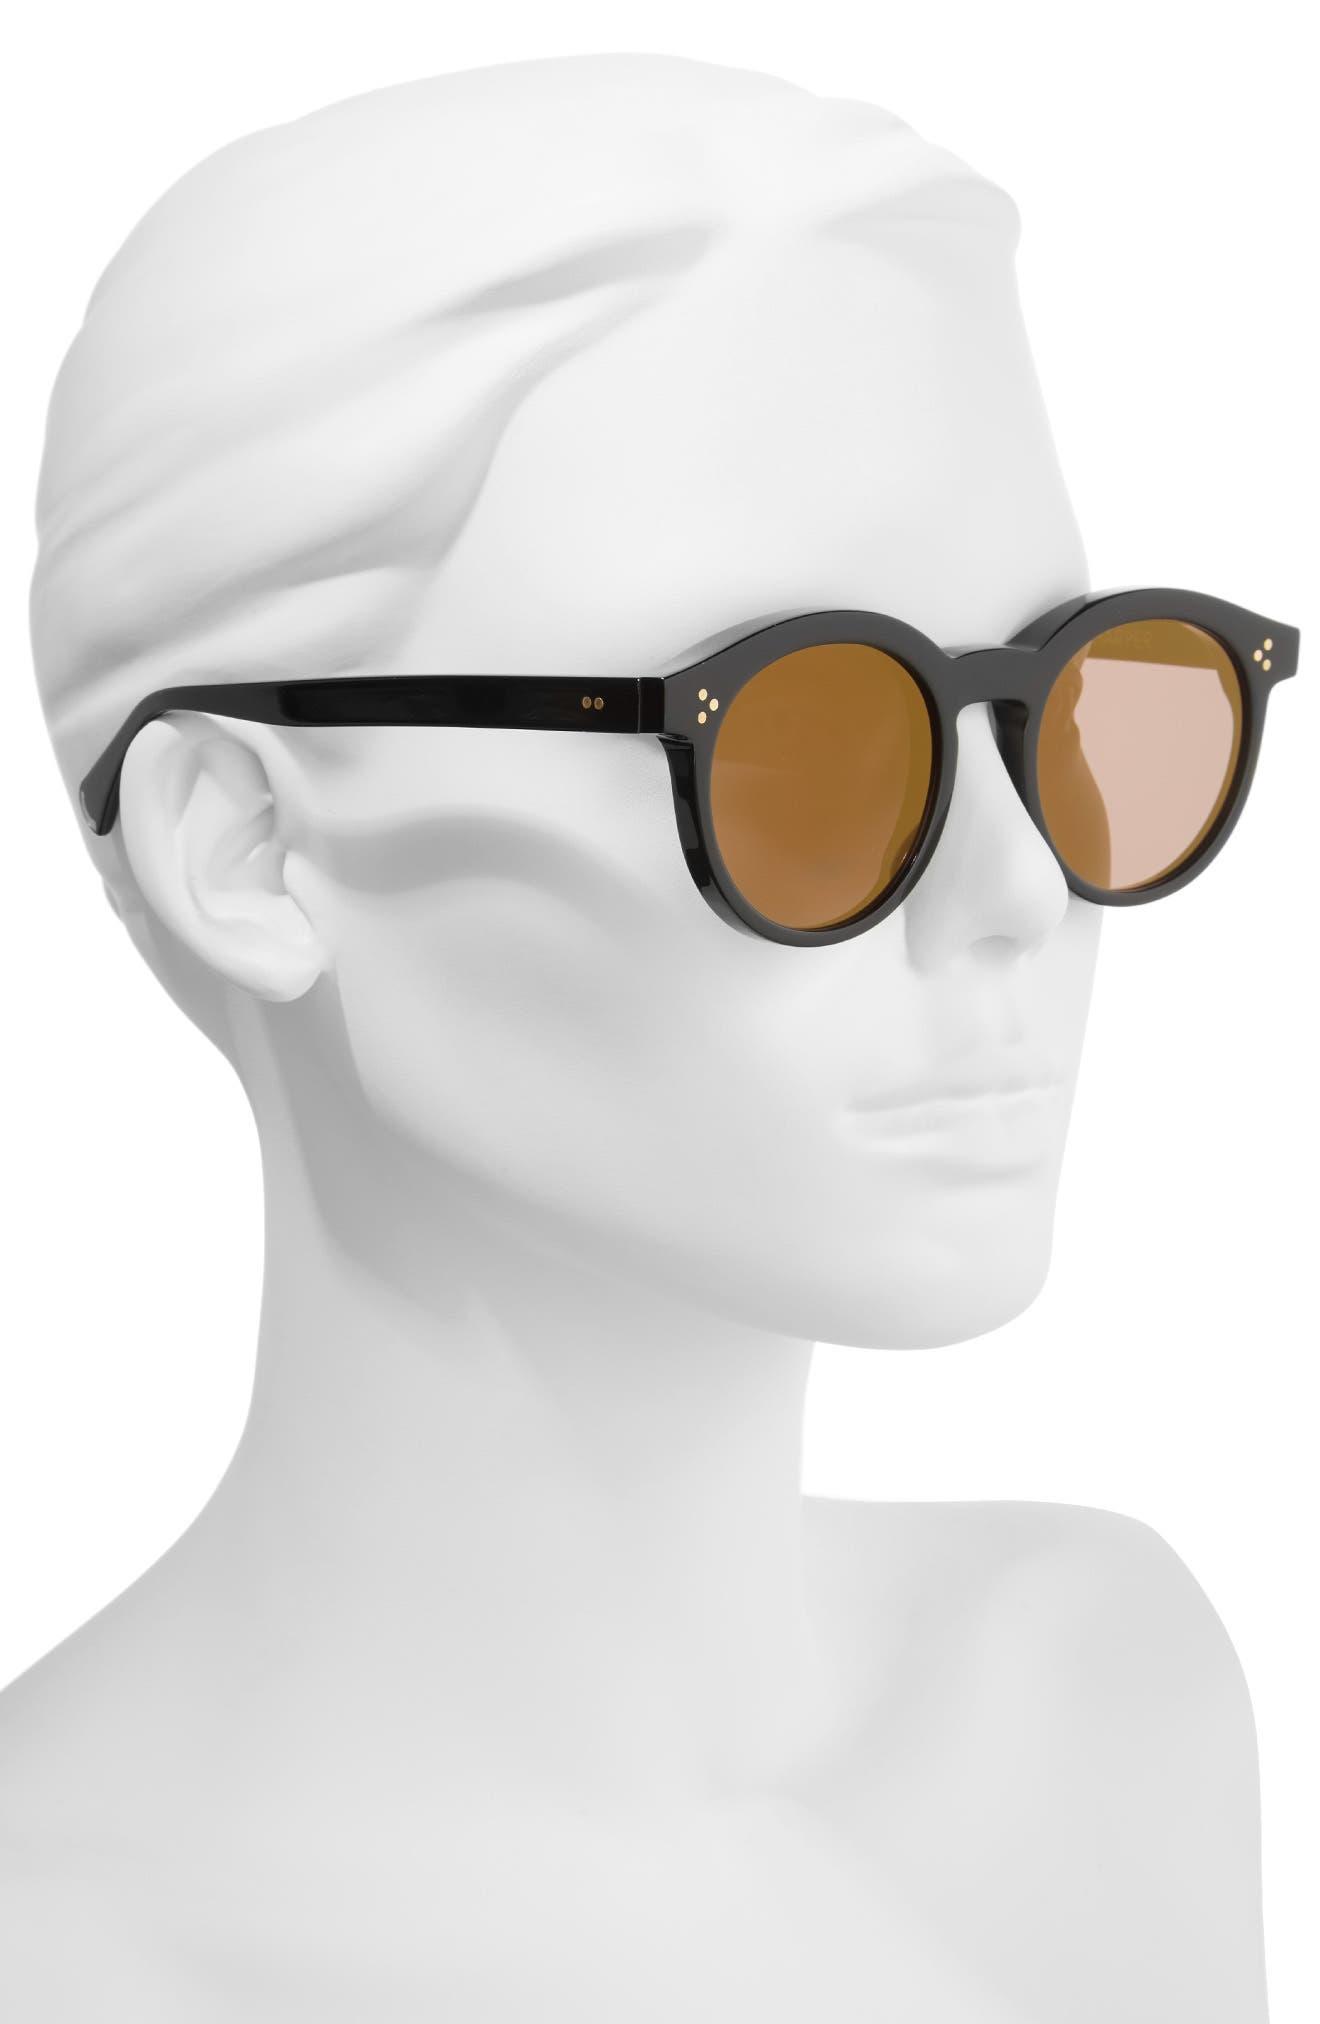 Harper Zero 53mm Round Keyhole Sunglasses,                             Alternate thumbnail 2, color,                             Black/ Gold